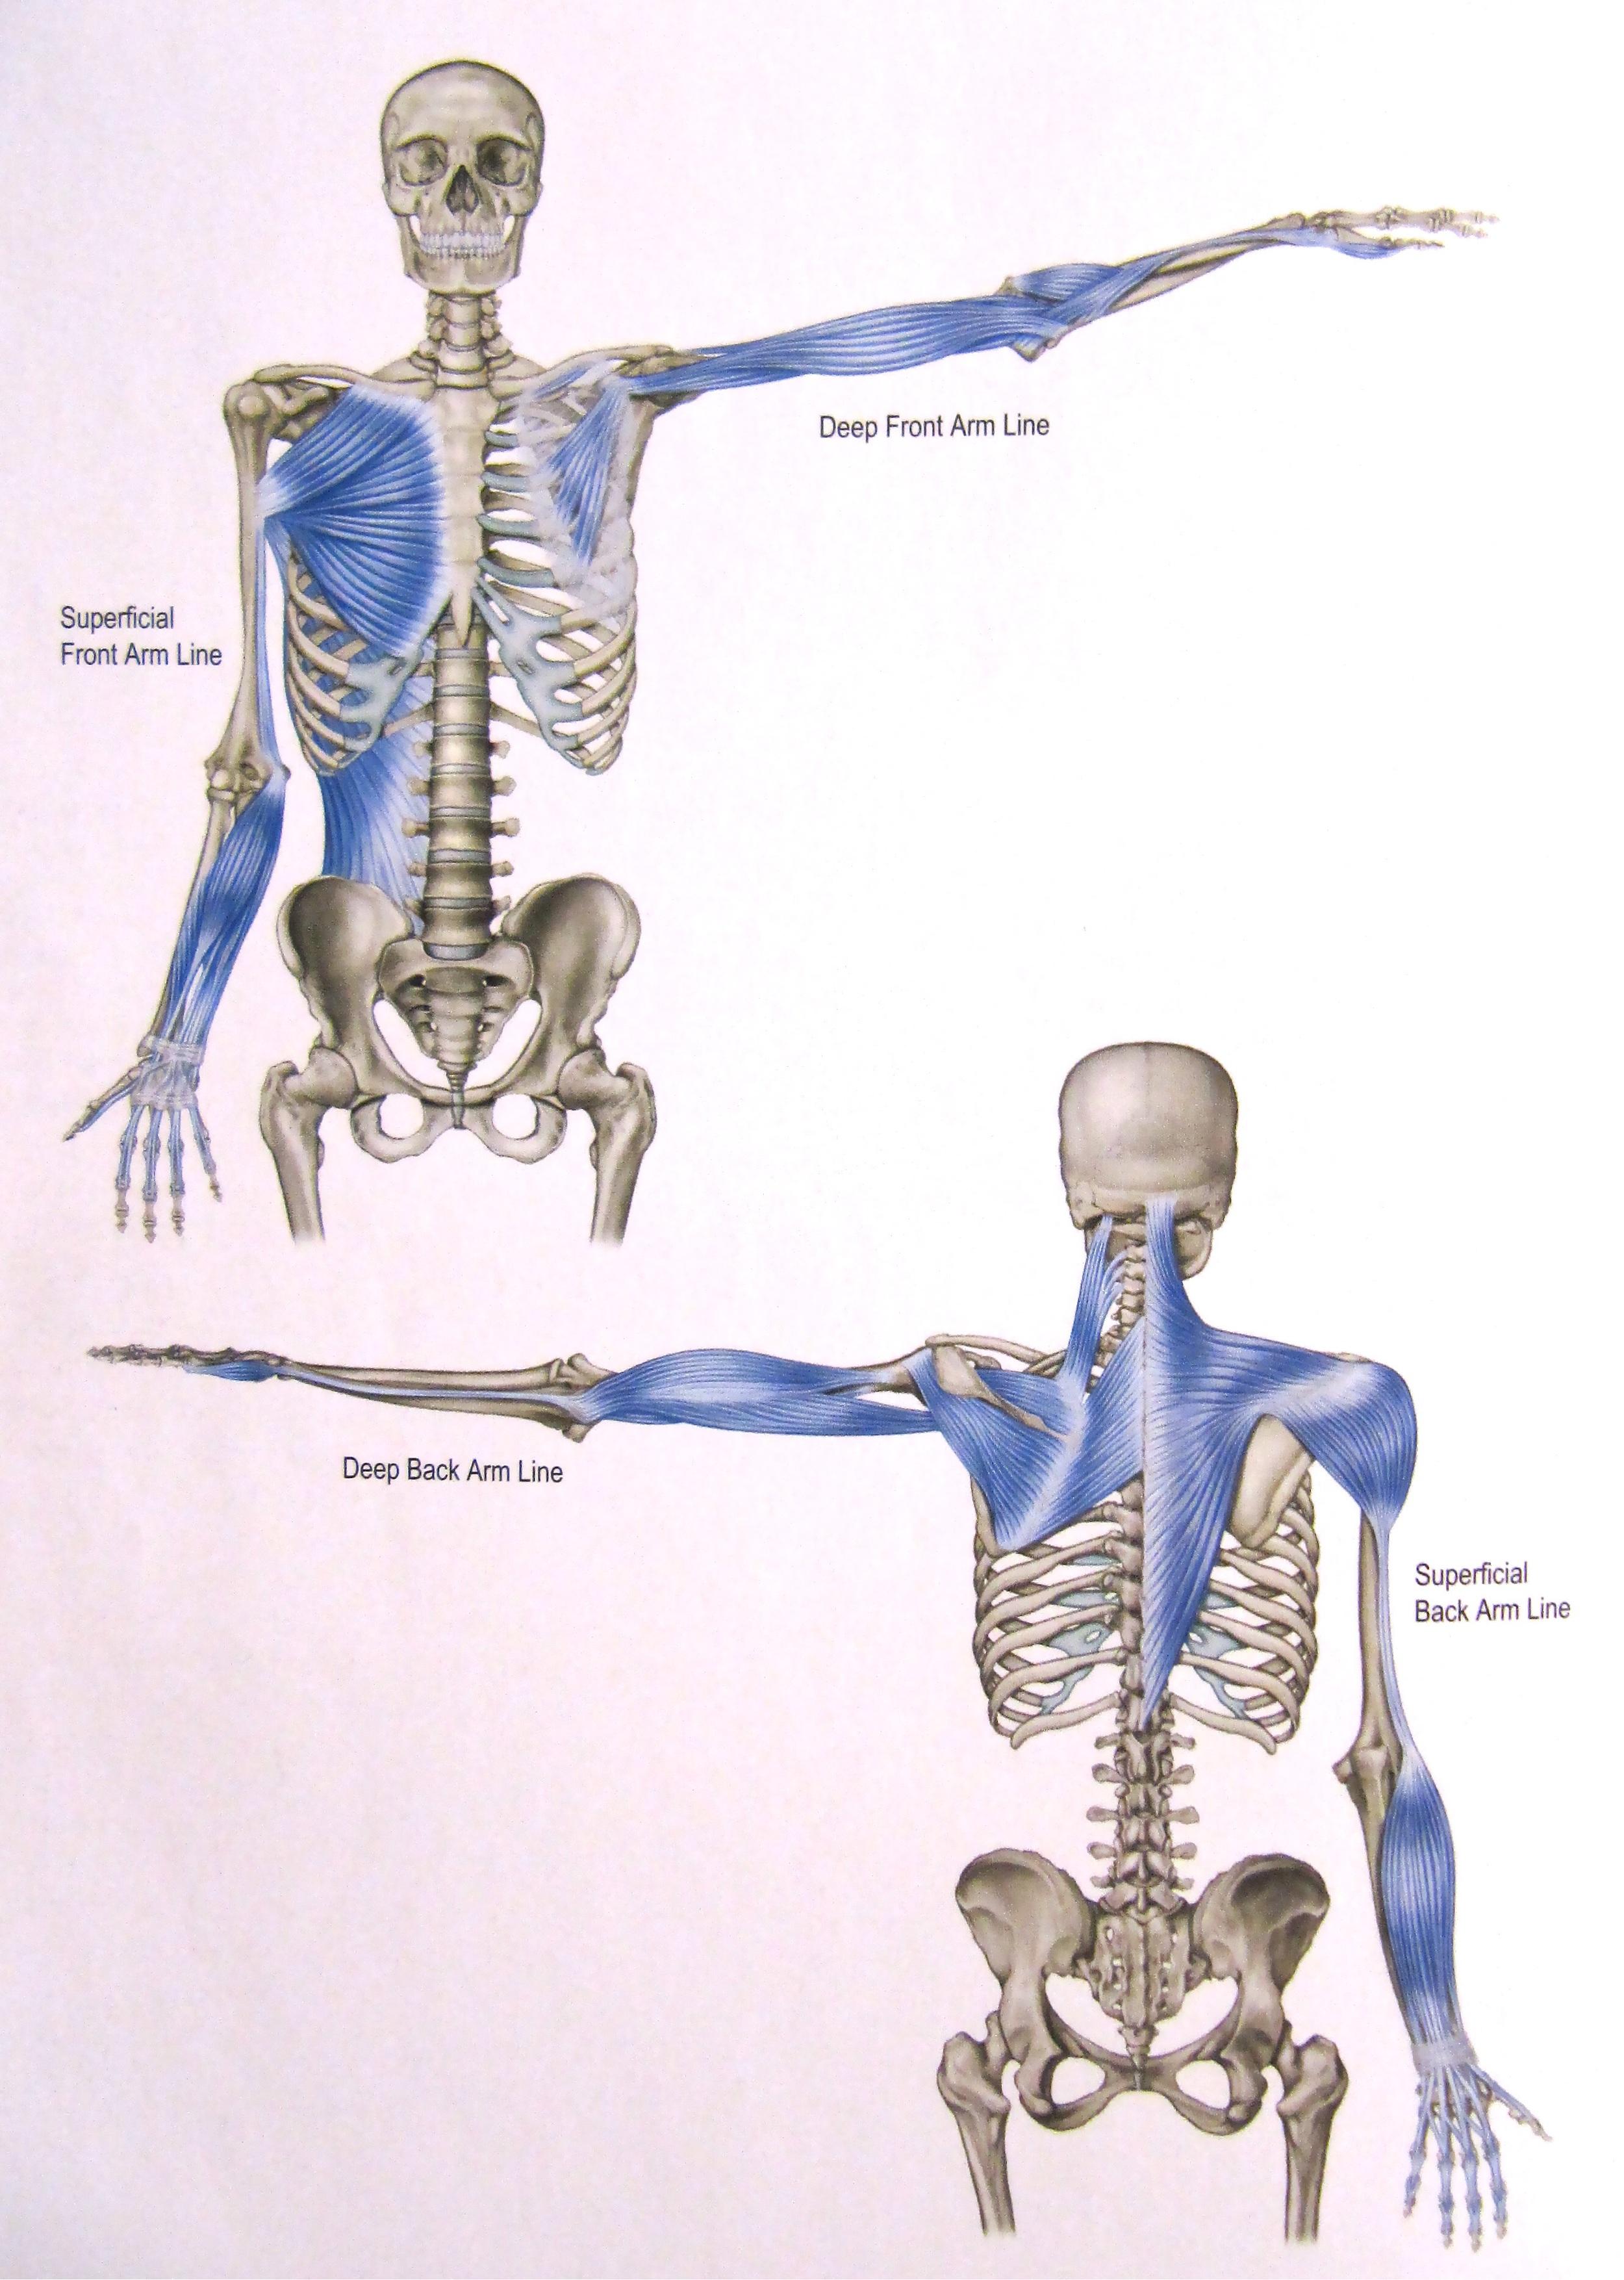 Superficial front arm Line